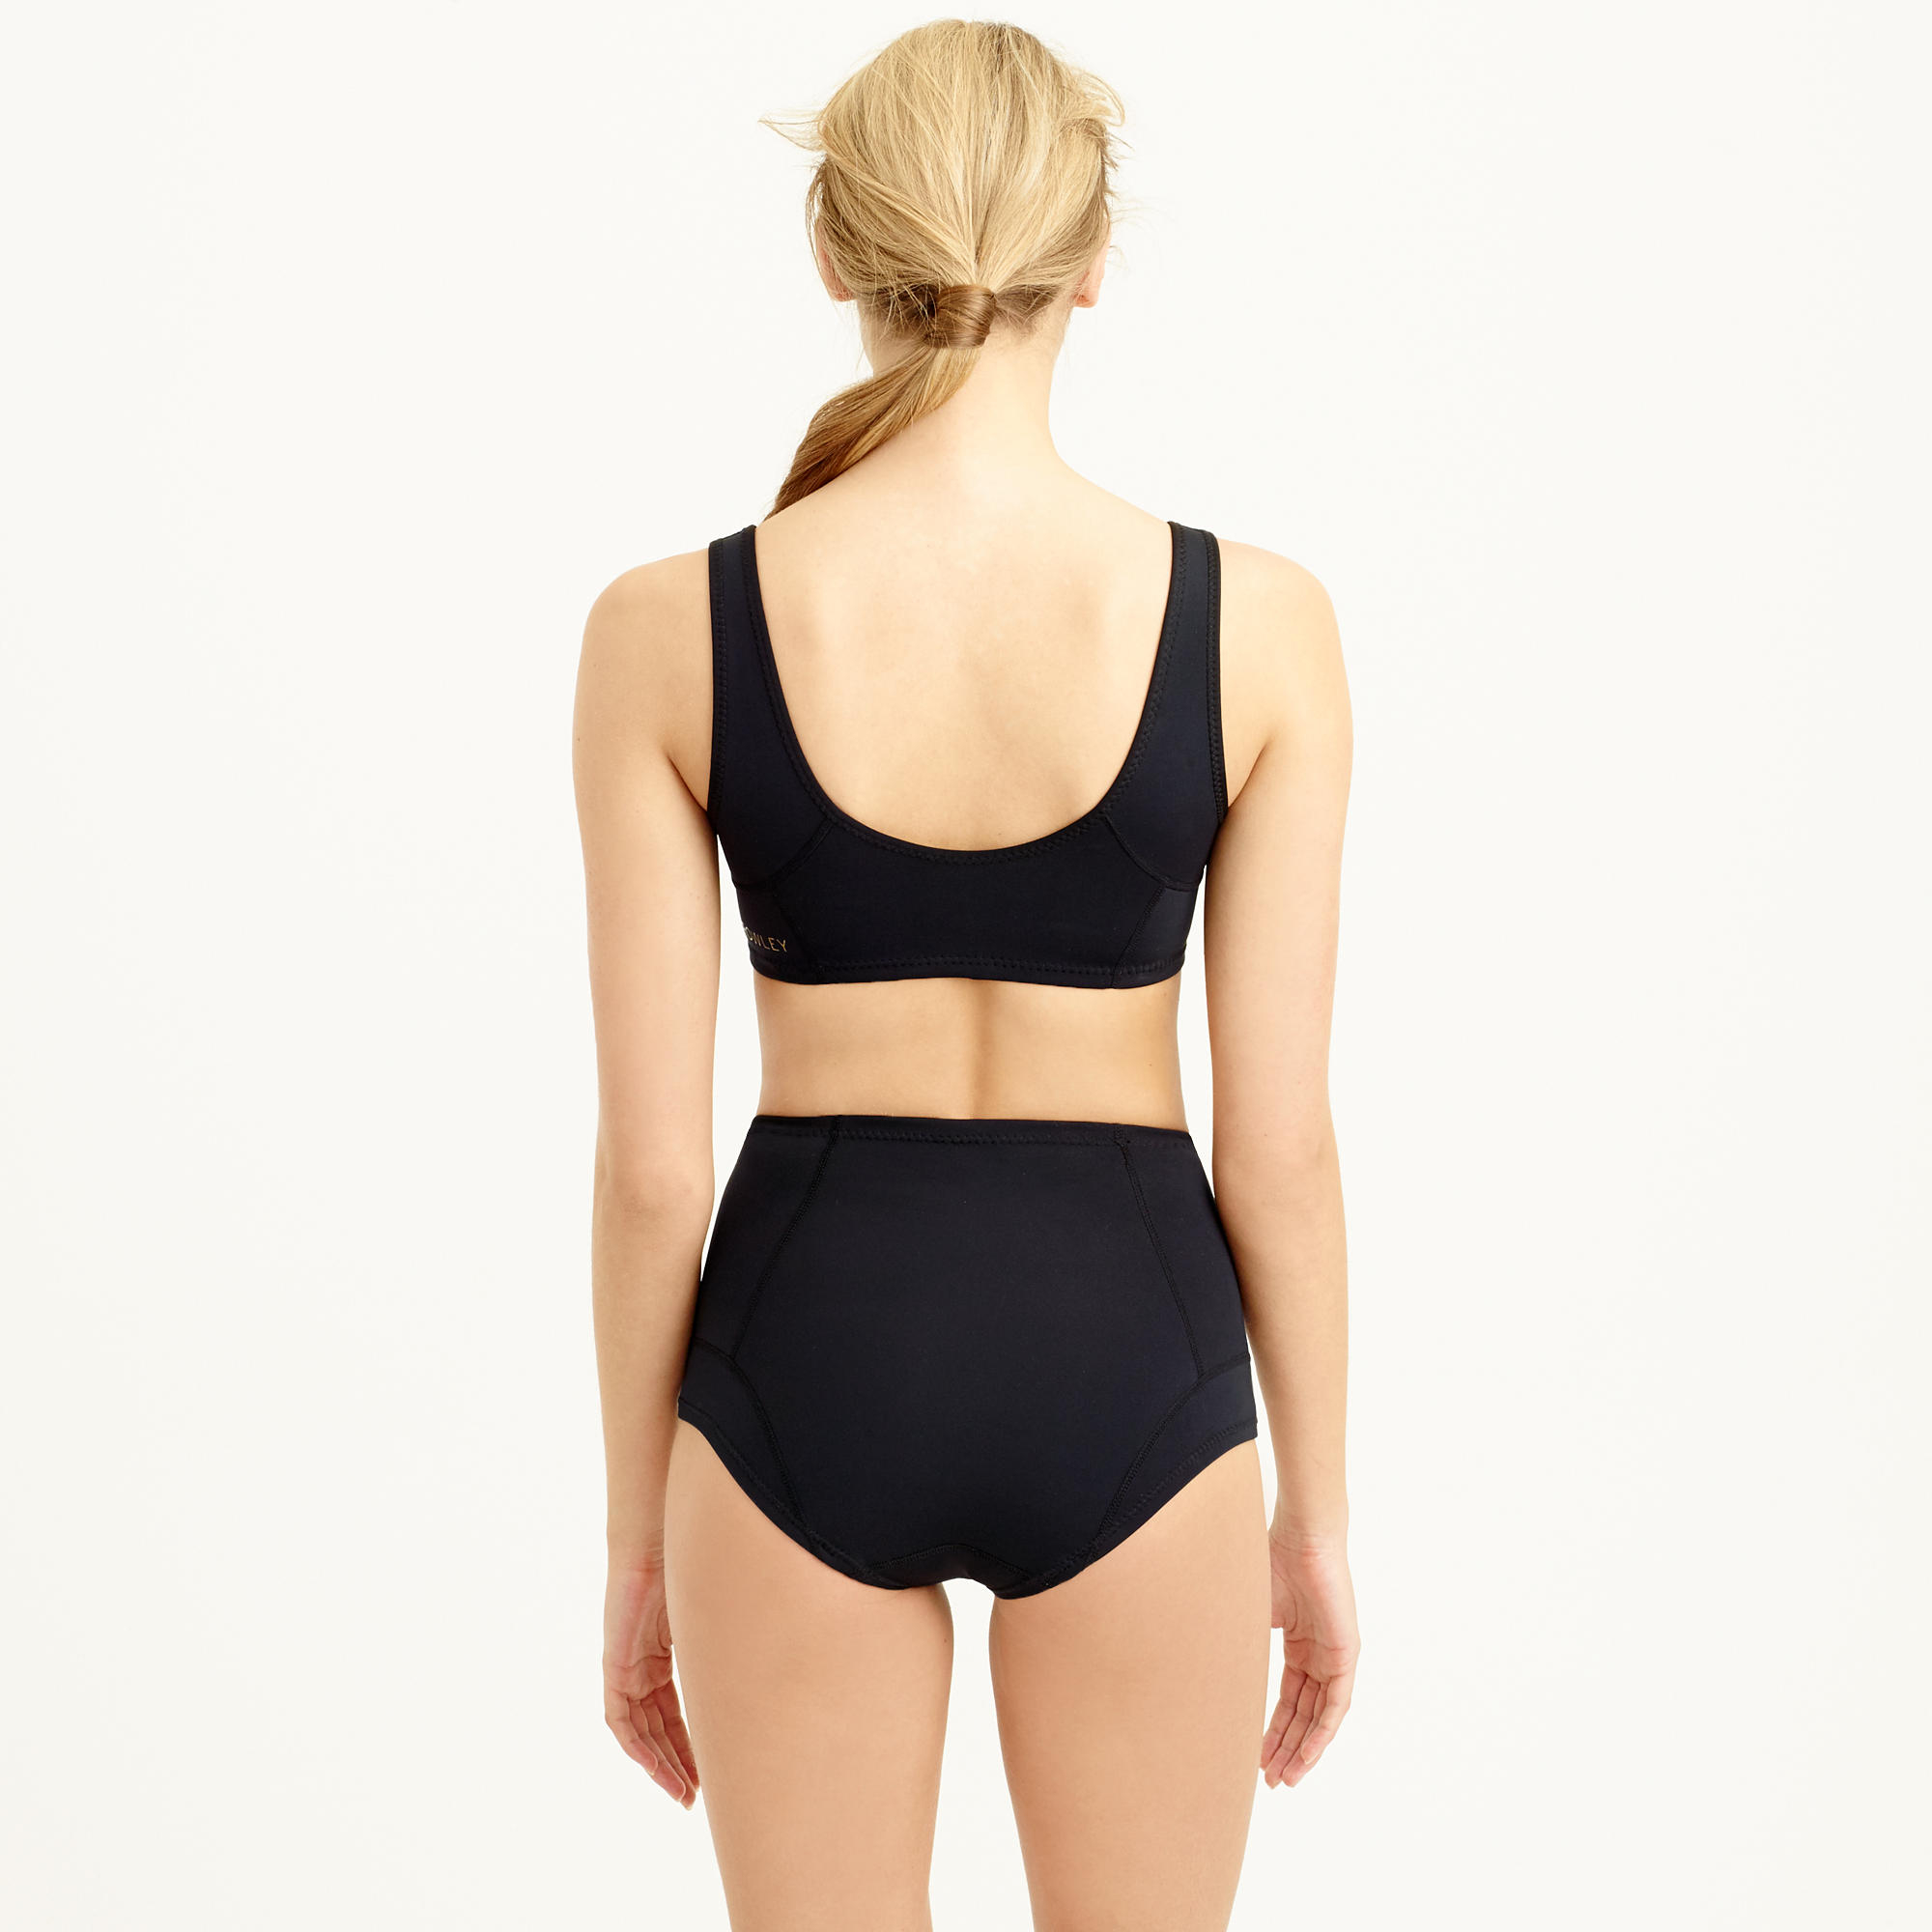 J Crew Cynthia Rowley High Waisted Bikini Bottom In Black